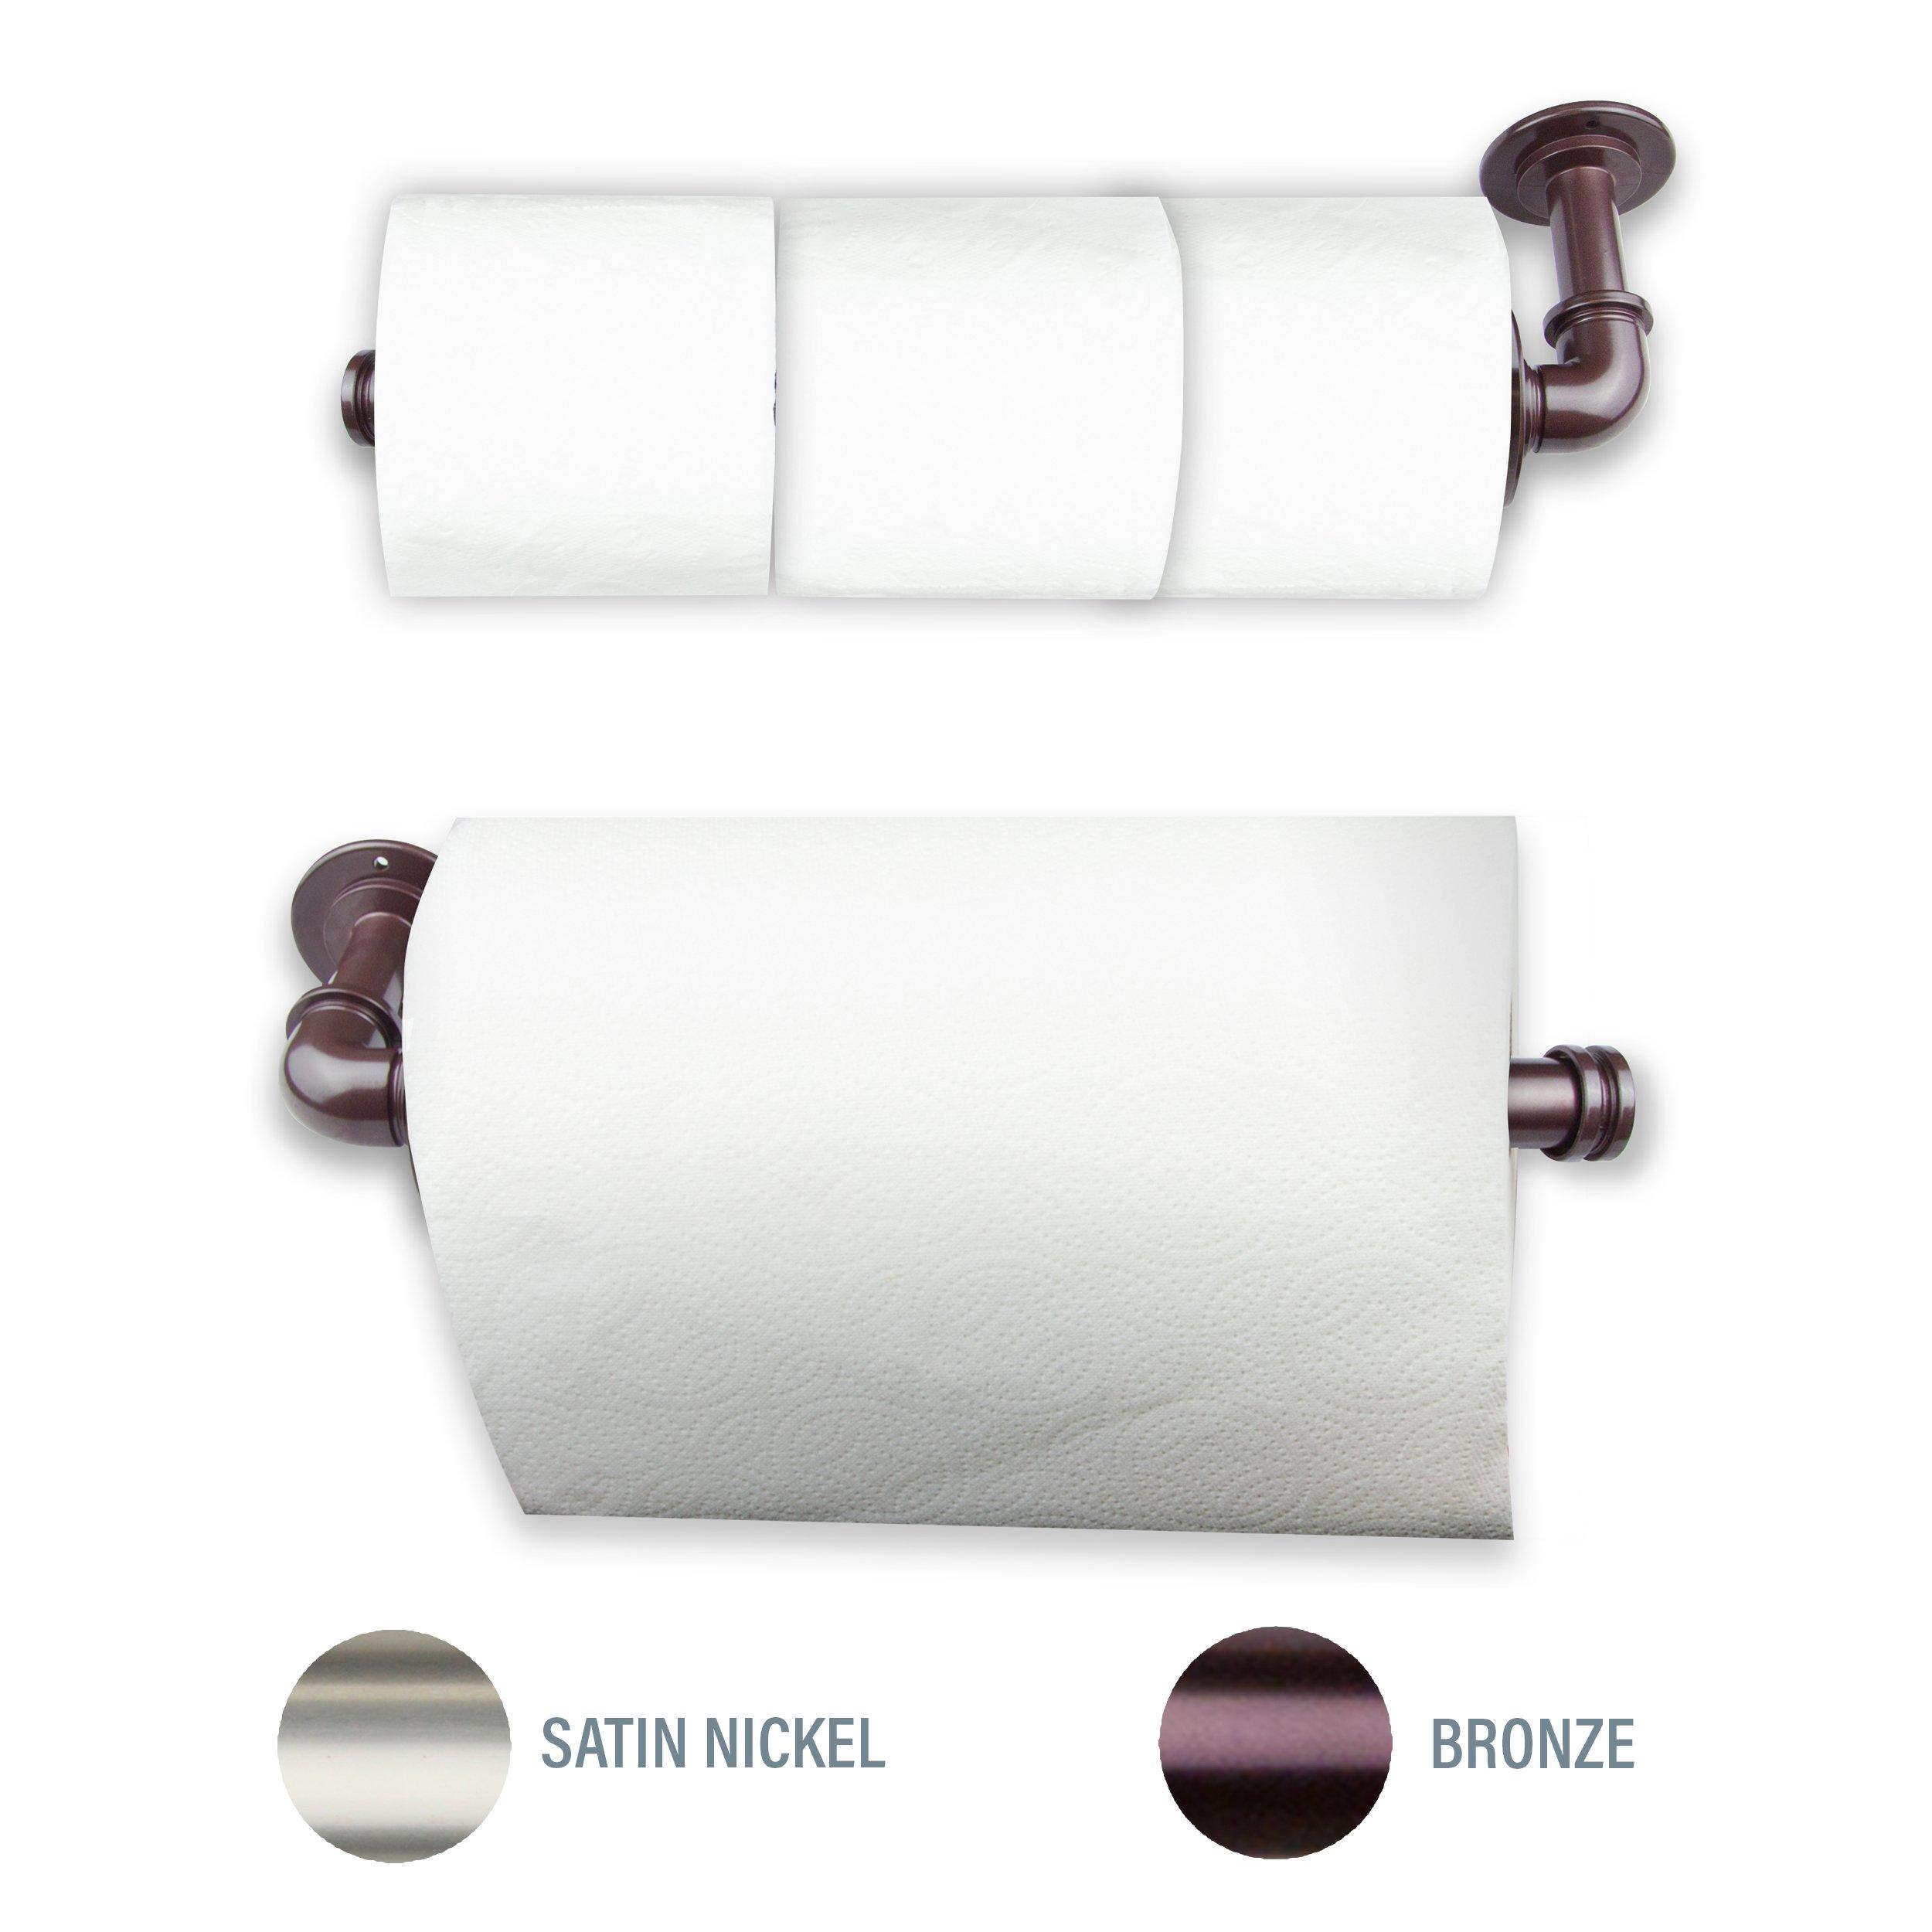 A&F Rod Décor Industrial Pipe Design Triple Toilet Paper Storage/Single Kitchen Towel Holder (1 pc) - Bronze